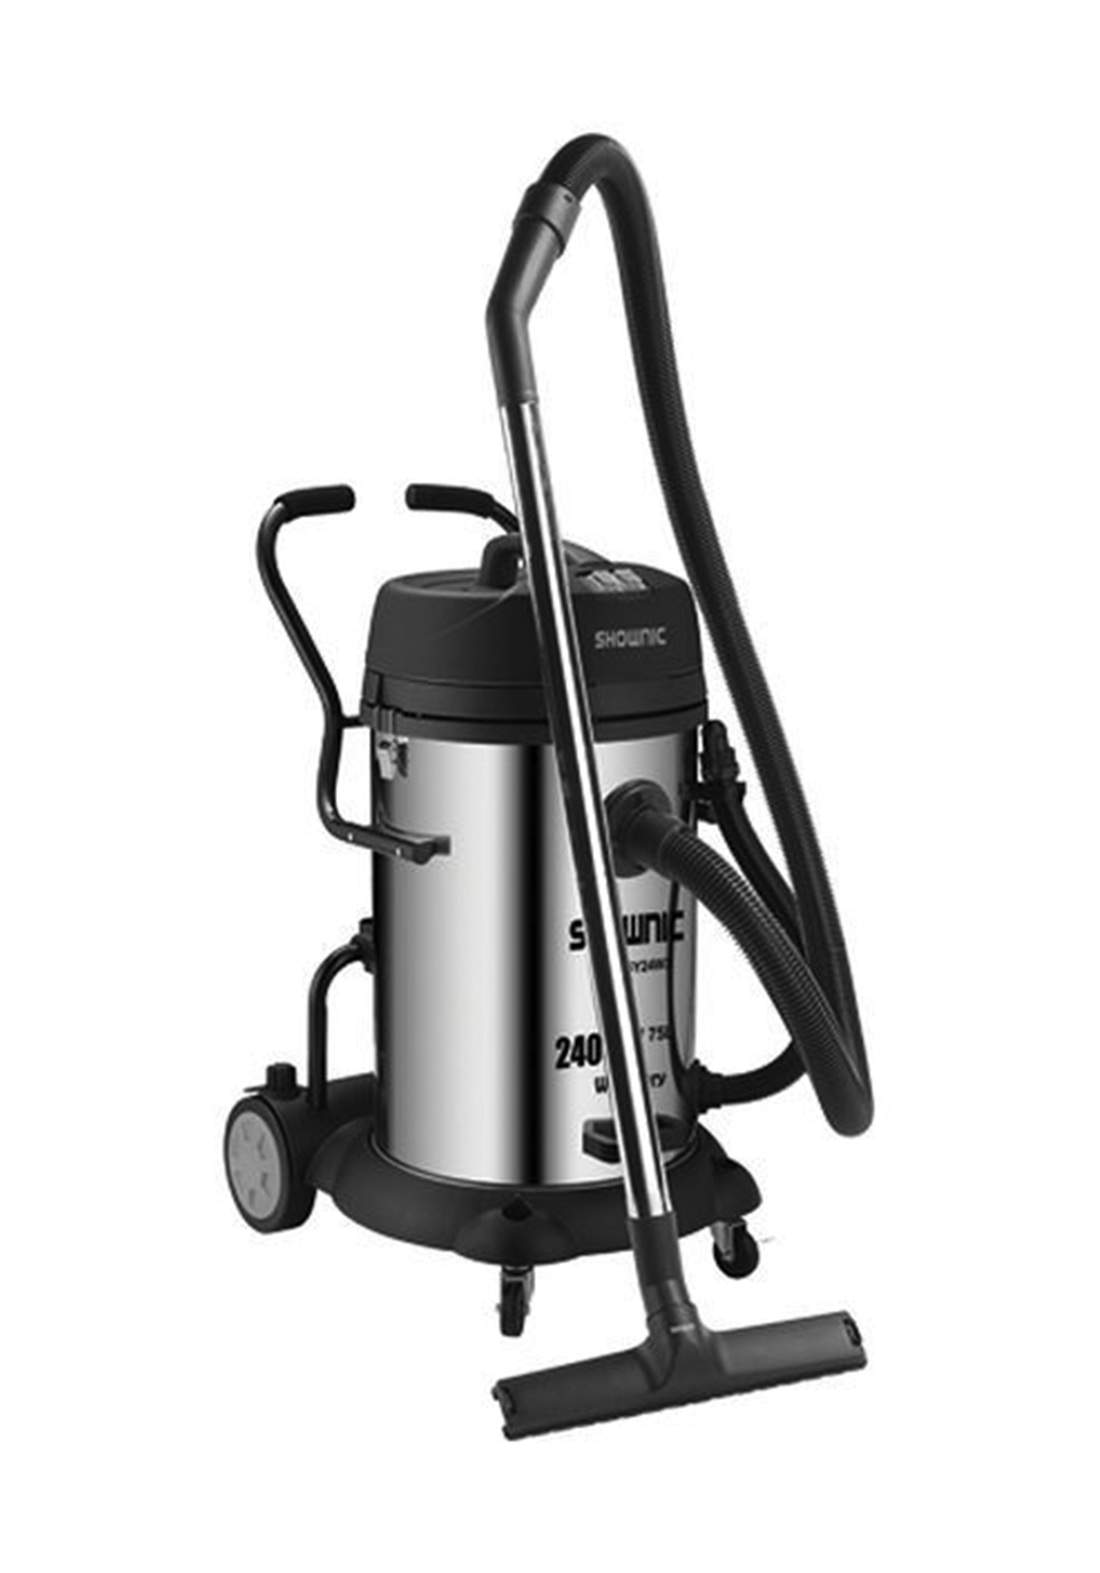 Shownic VB-75Y24WX - 2400 W - Drum Vacuum Cleaner مكنسة كهربائية